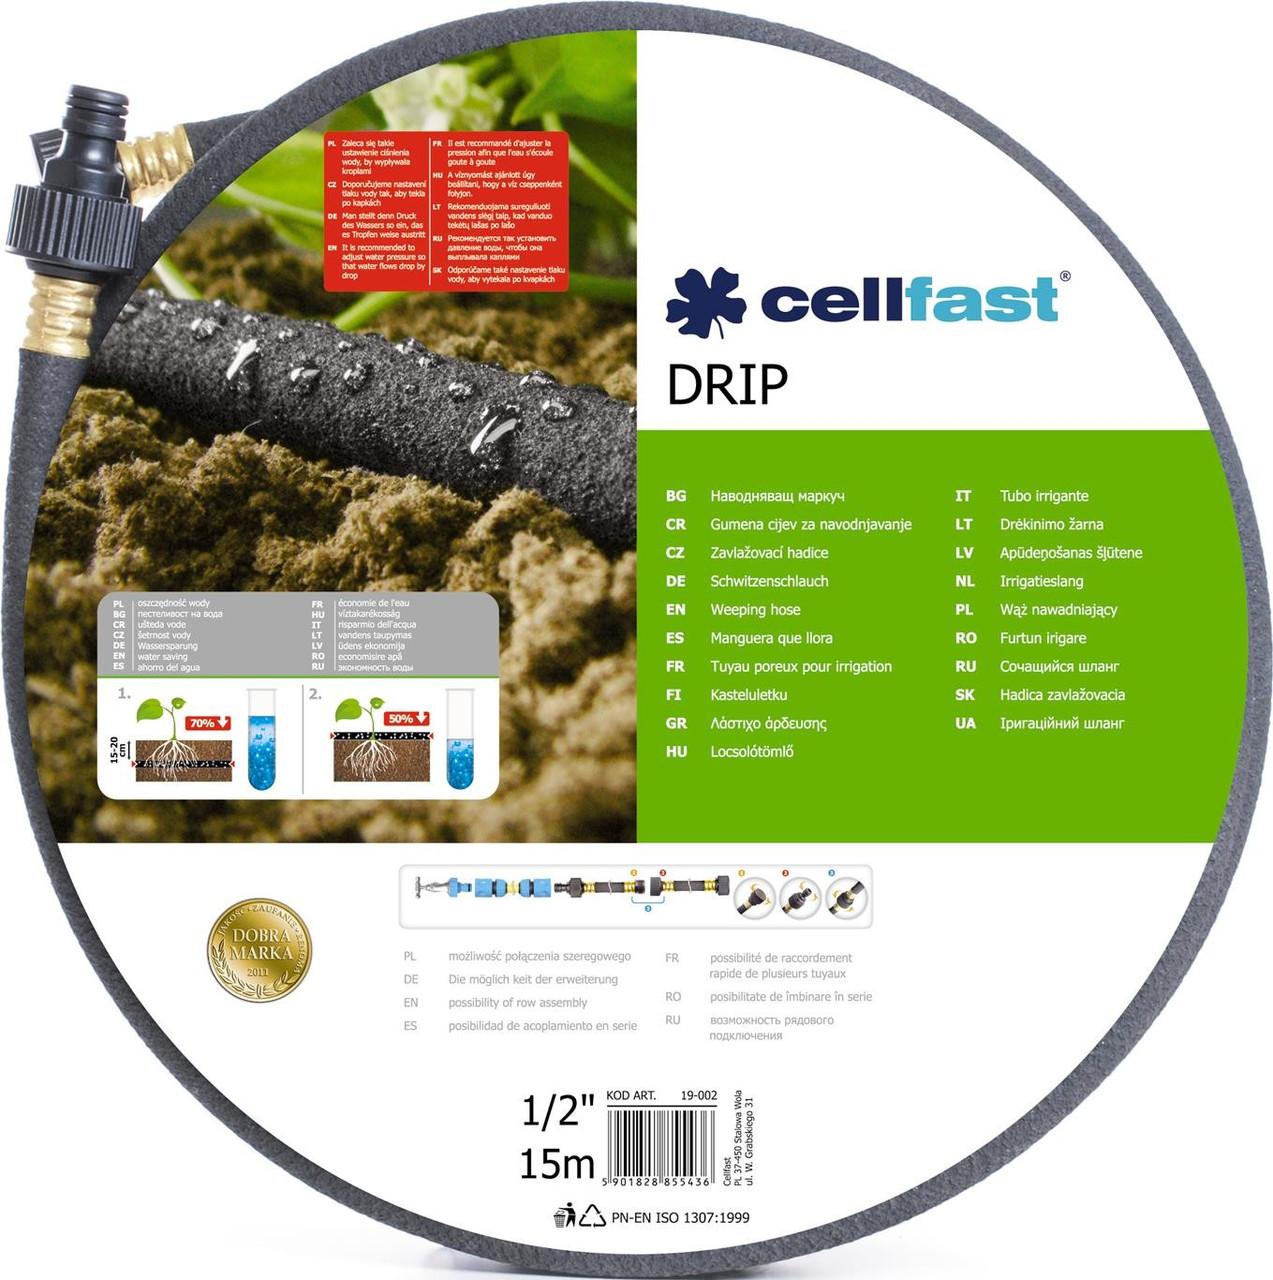 Сочащийся шланг cellfast Drip 1/2 дюйма 7,5 метров